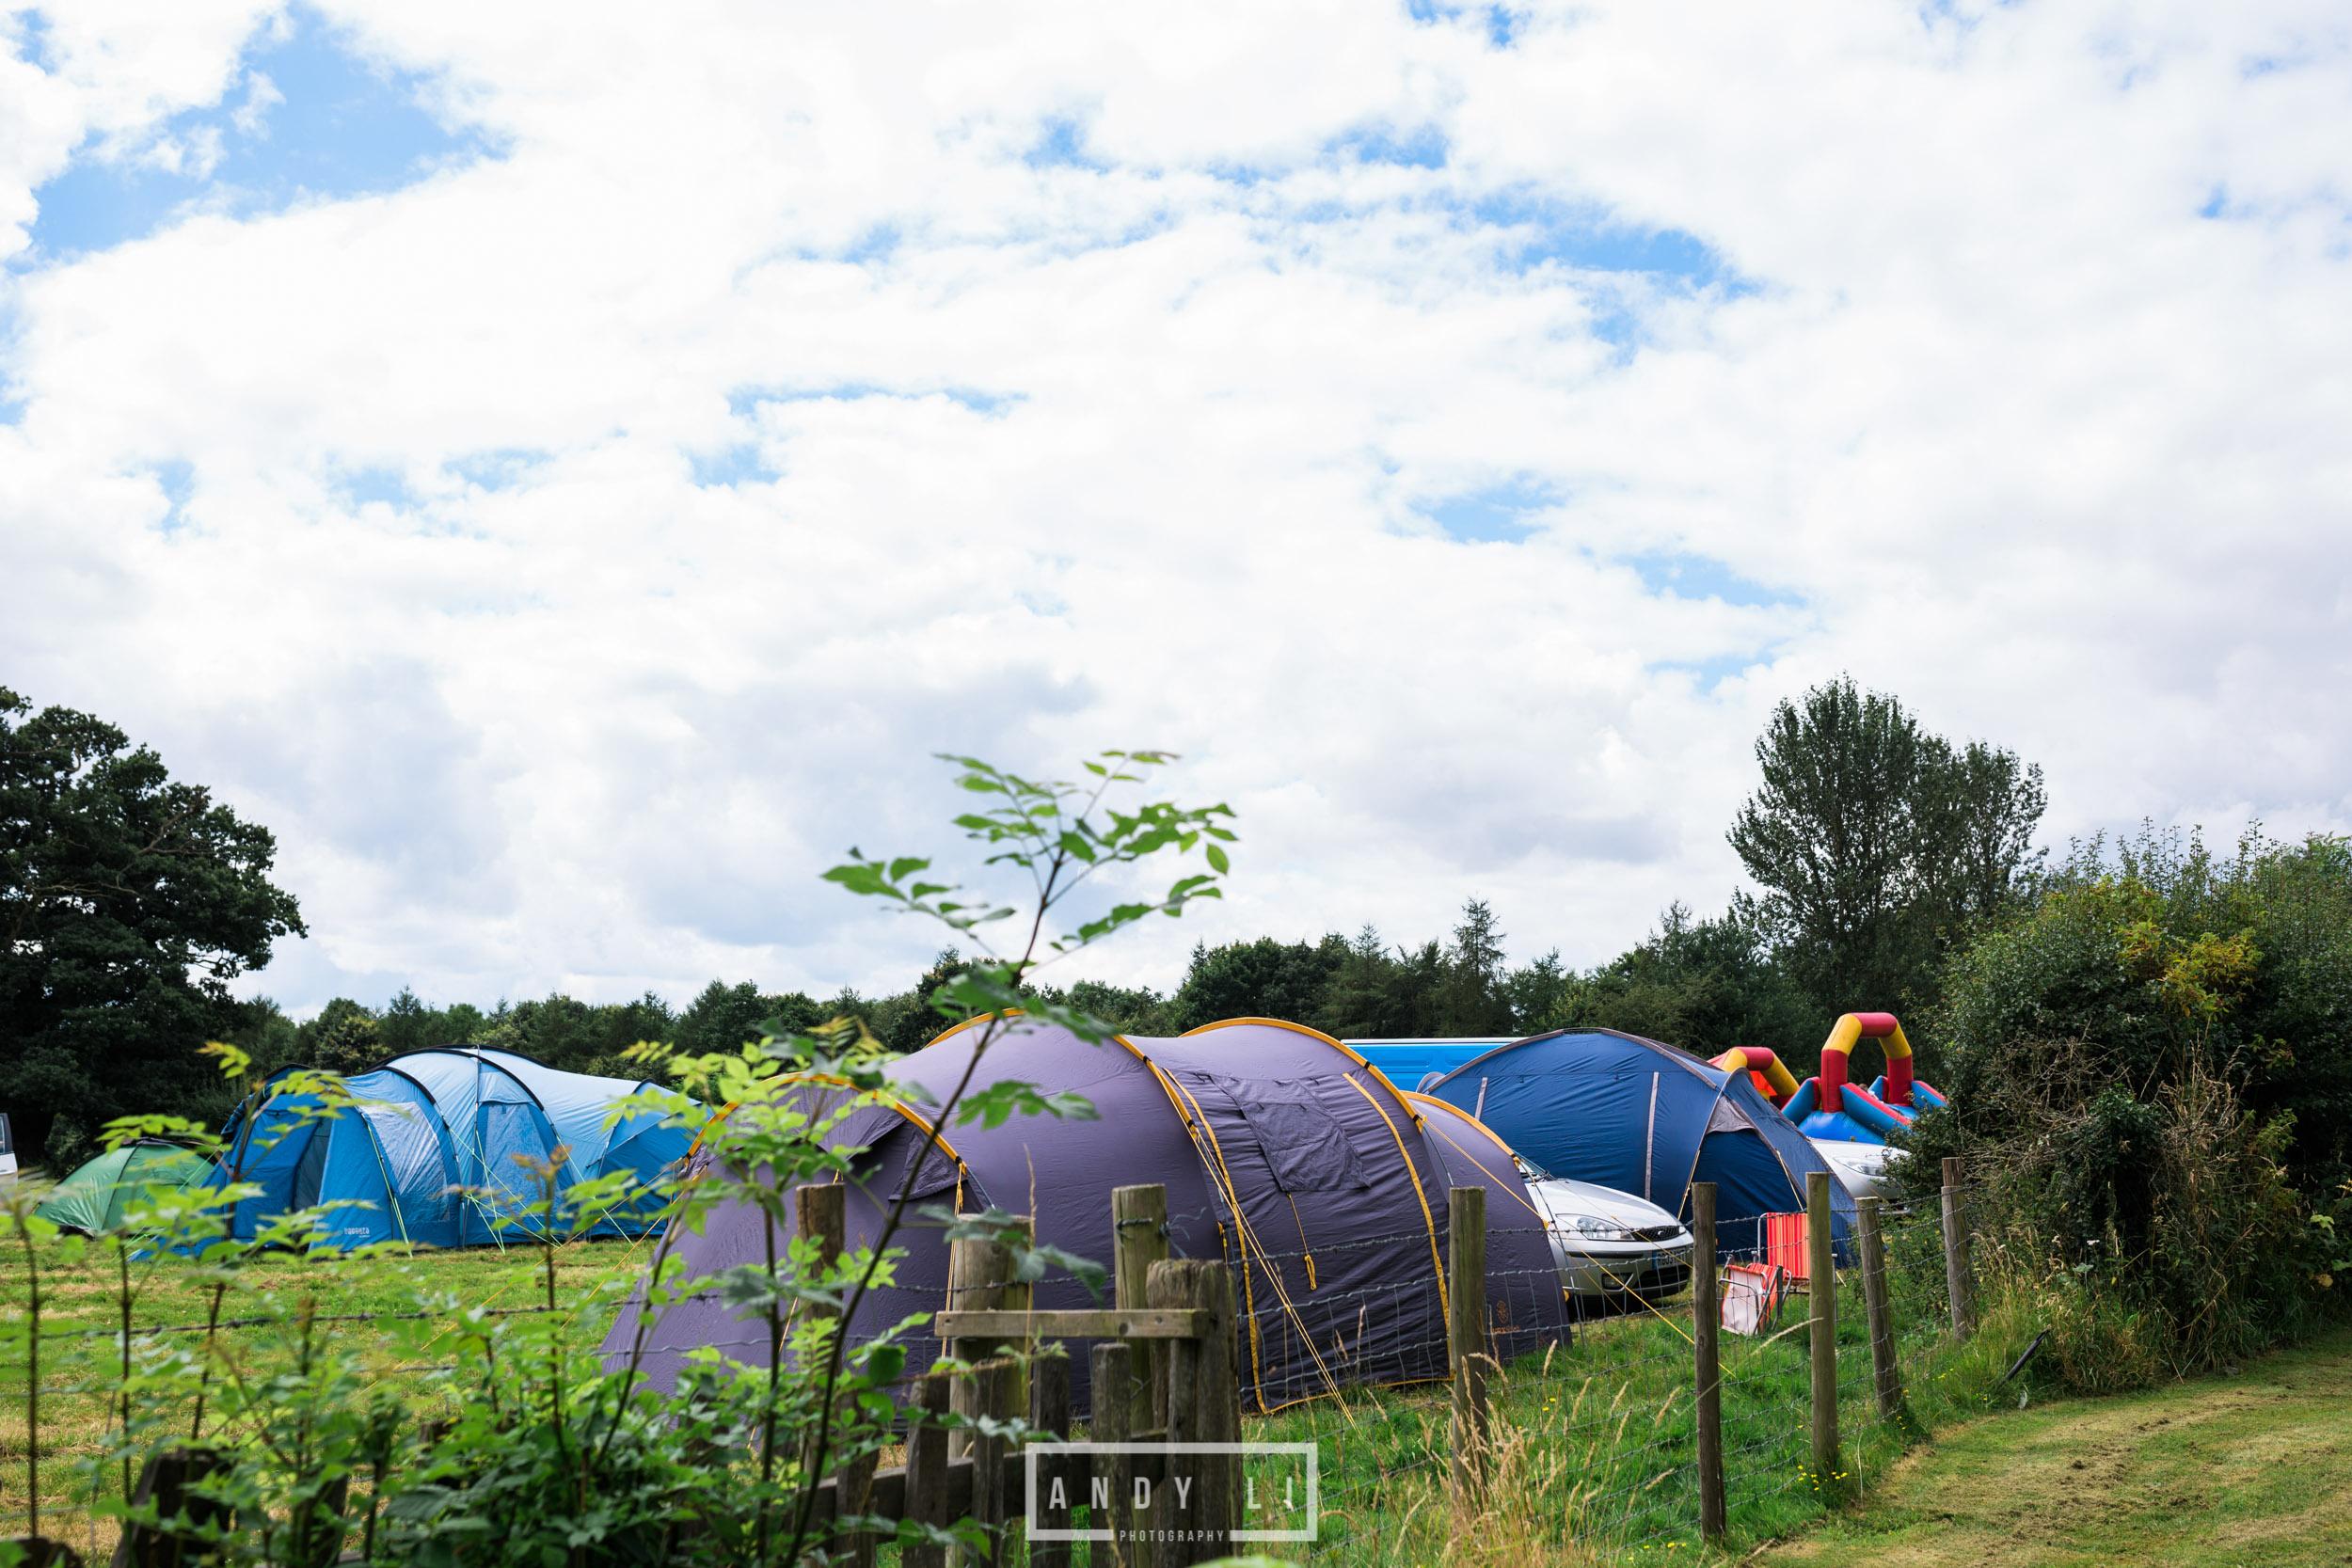 Festival Wedding Shropshire-Andy Li Photography-031.jpg